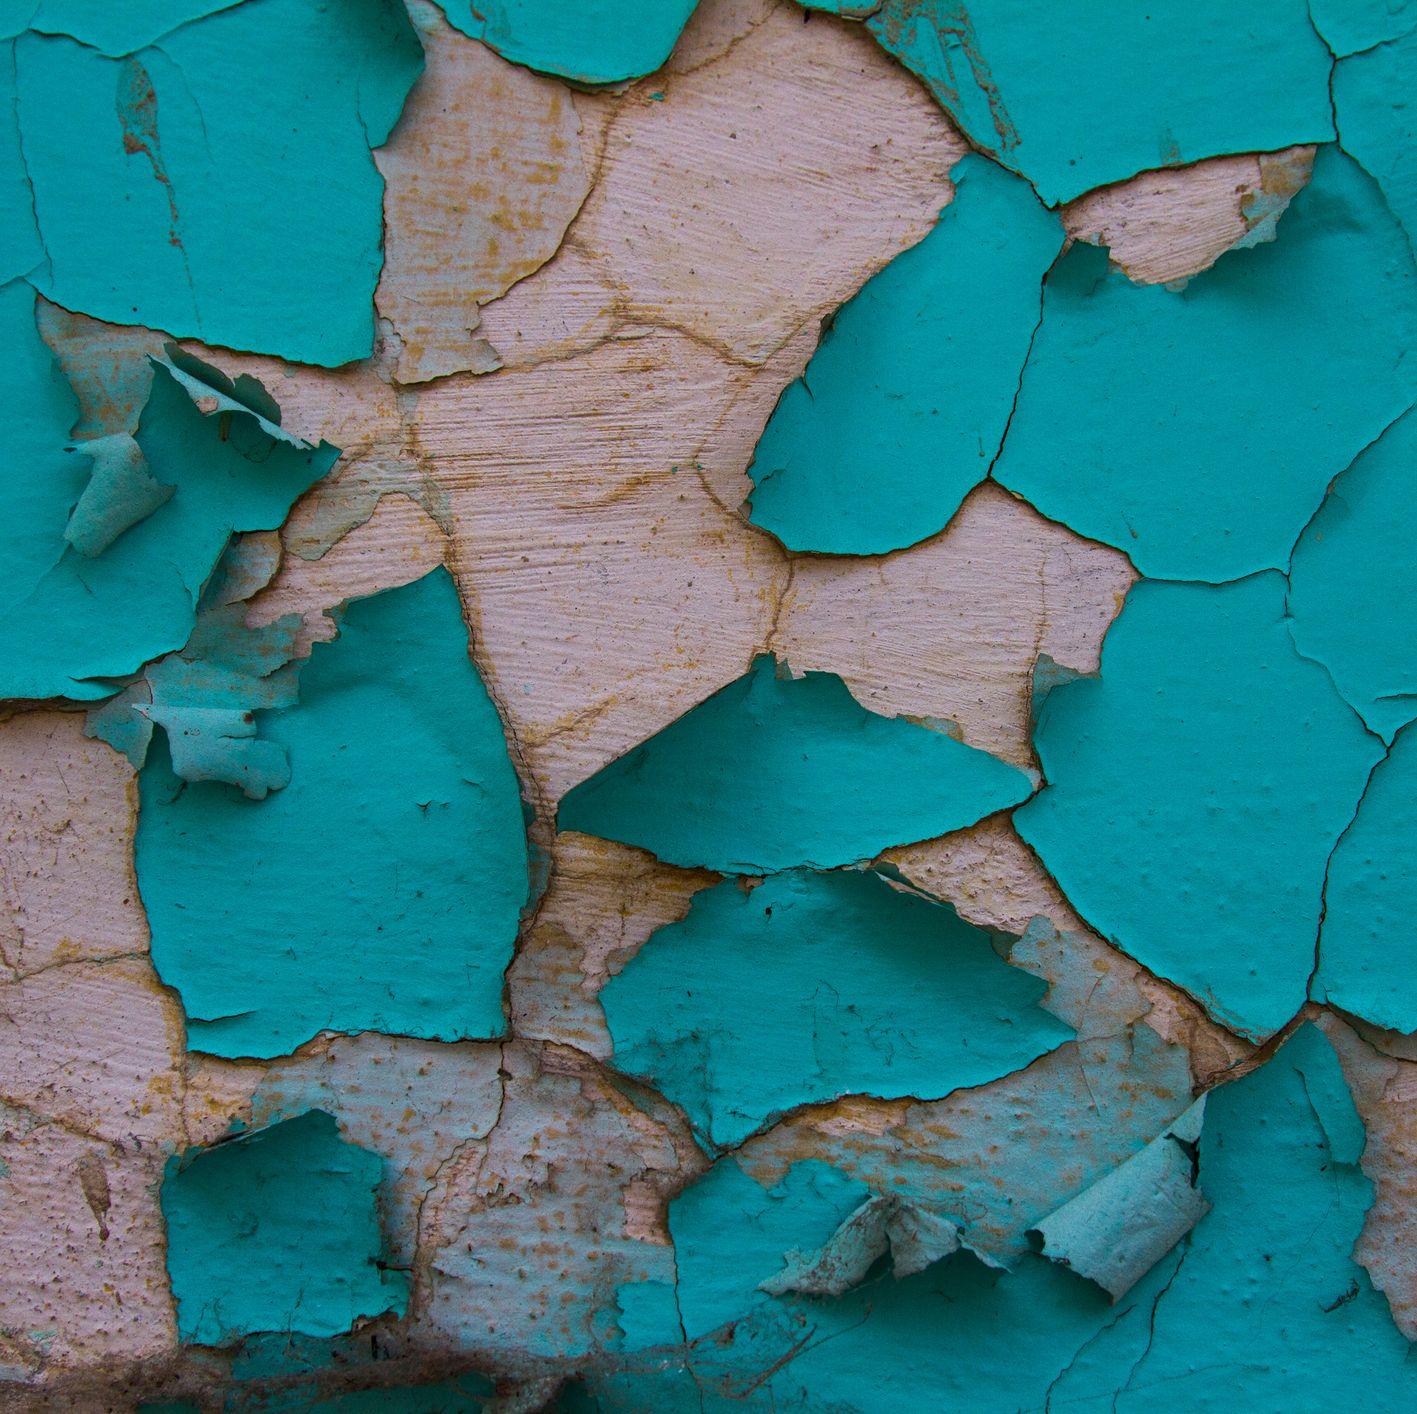 6 Ways To Get Rid Of Dry, Peeling Skin Fast